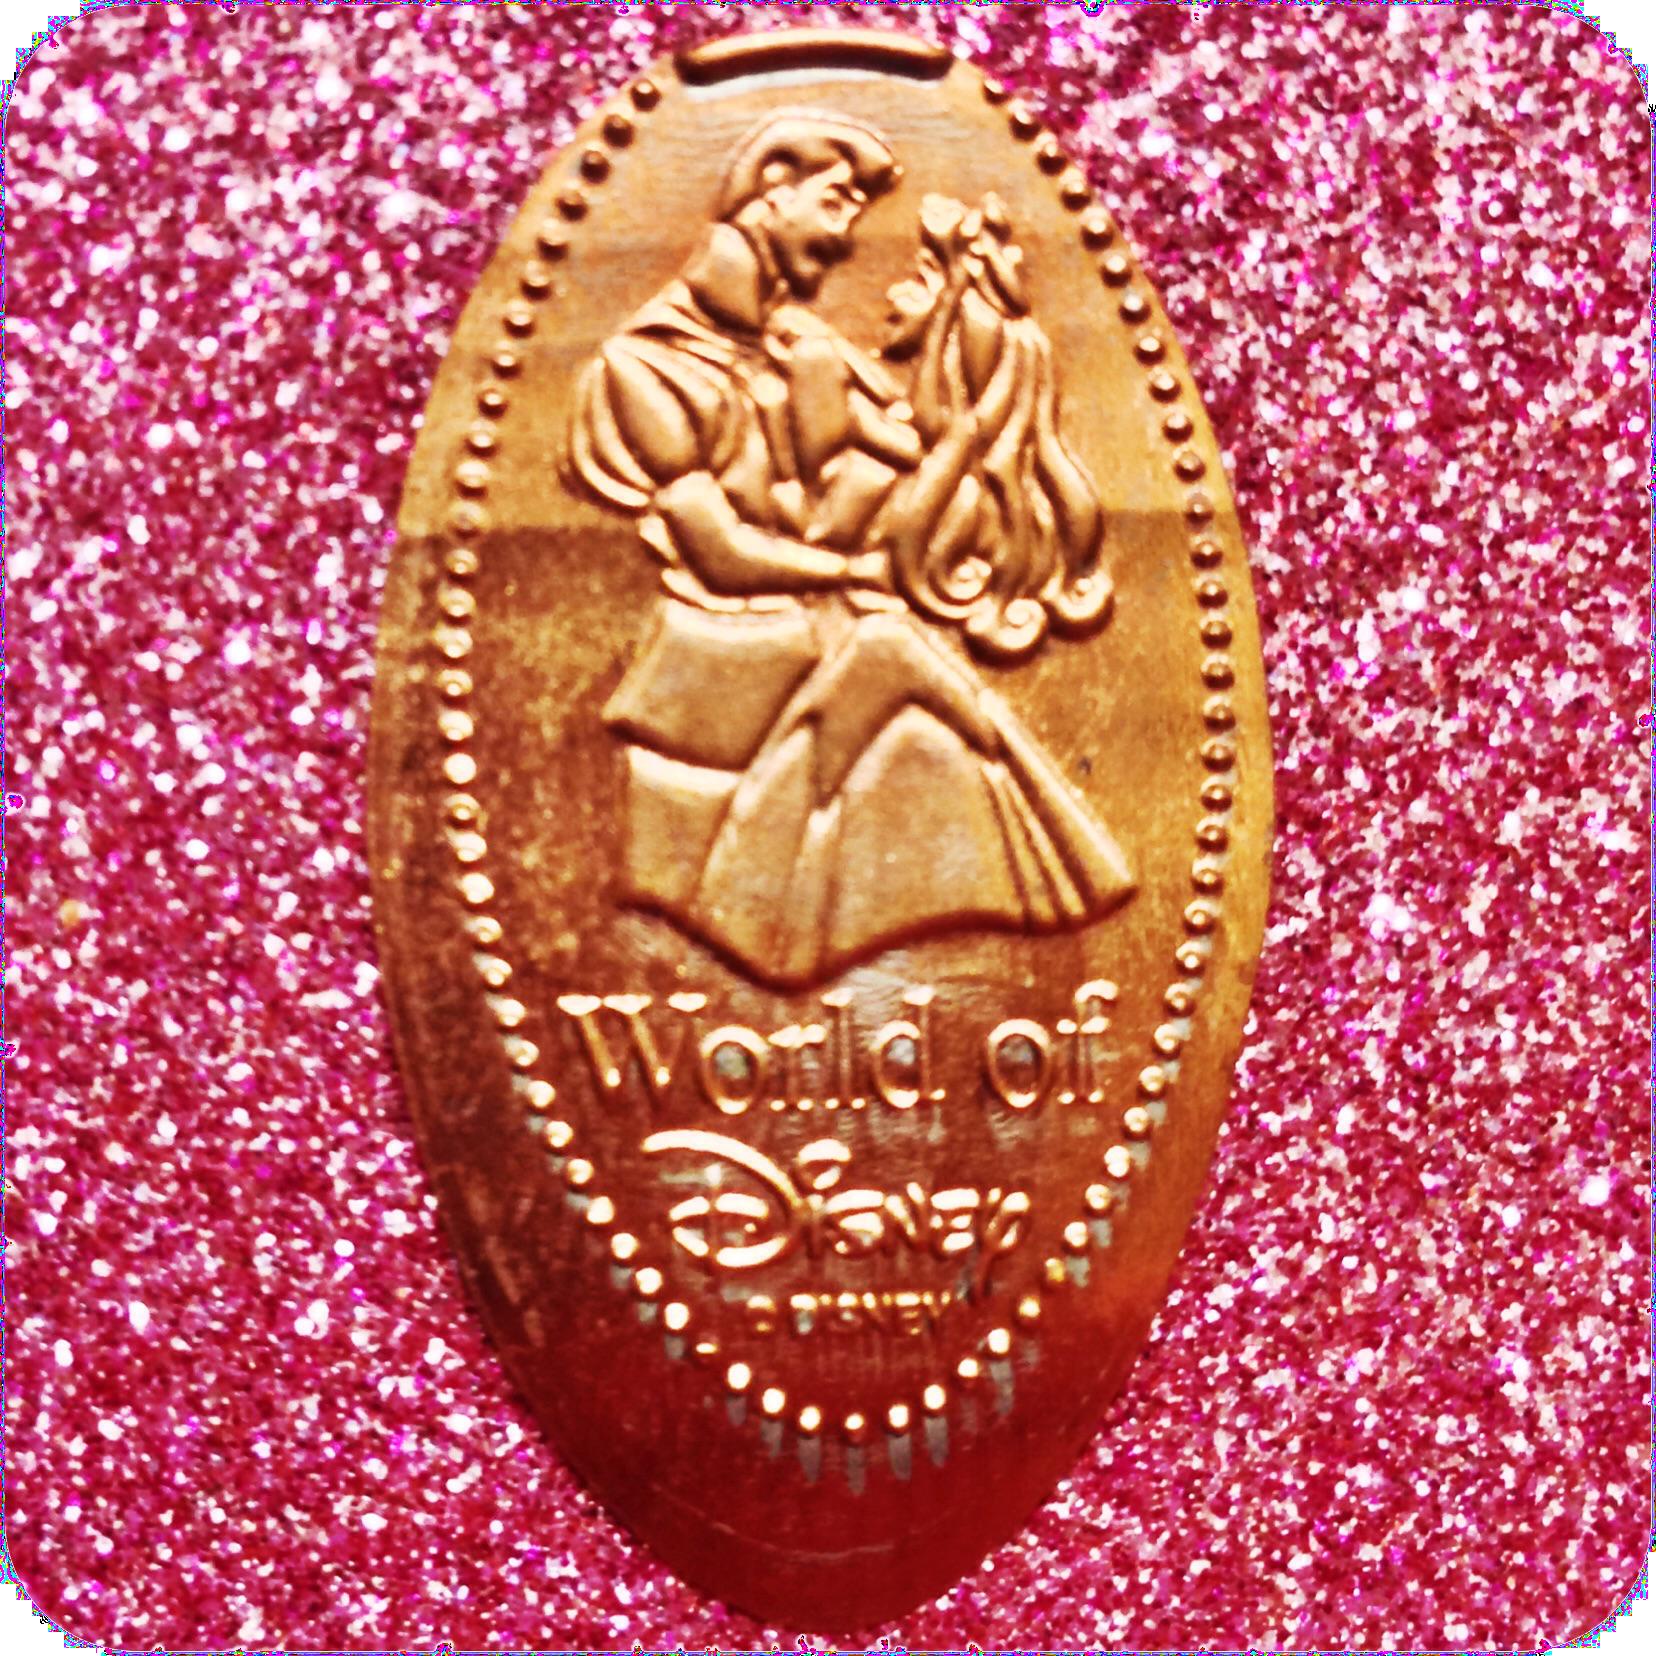 Sleeping Beauty/Princess Aurora in Prince Phillip's Arms World of Disney DTD0063